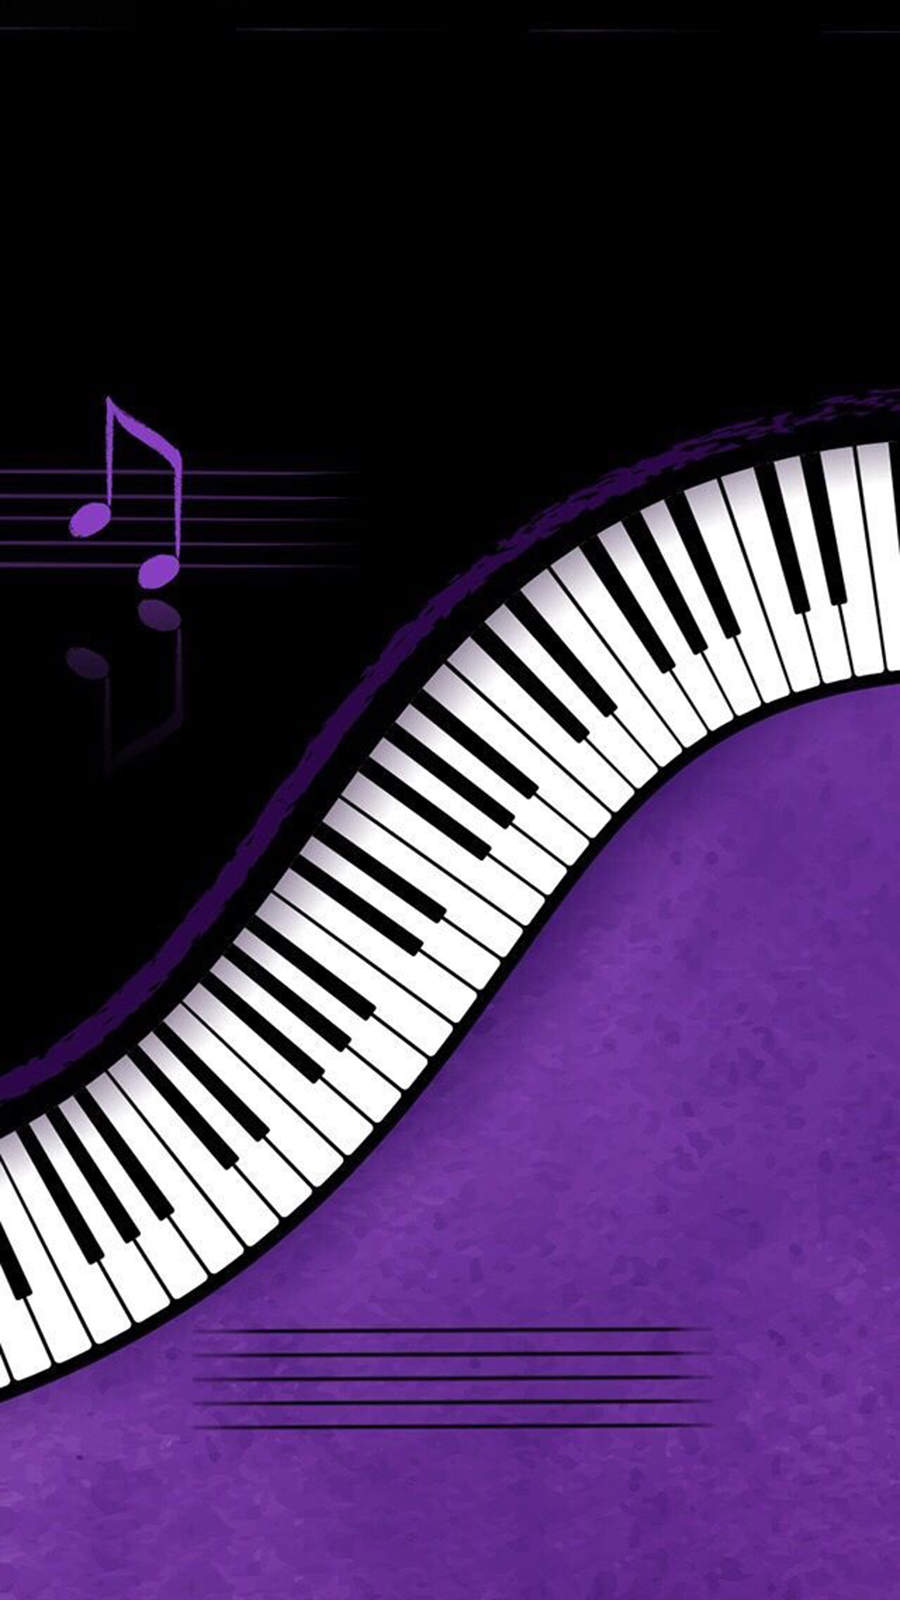 Piano Walpapers Free Donwload